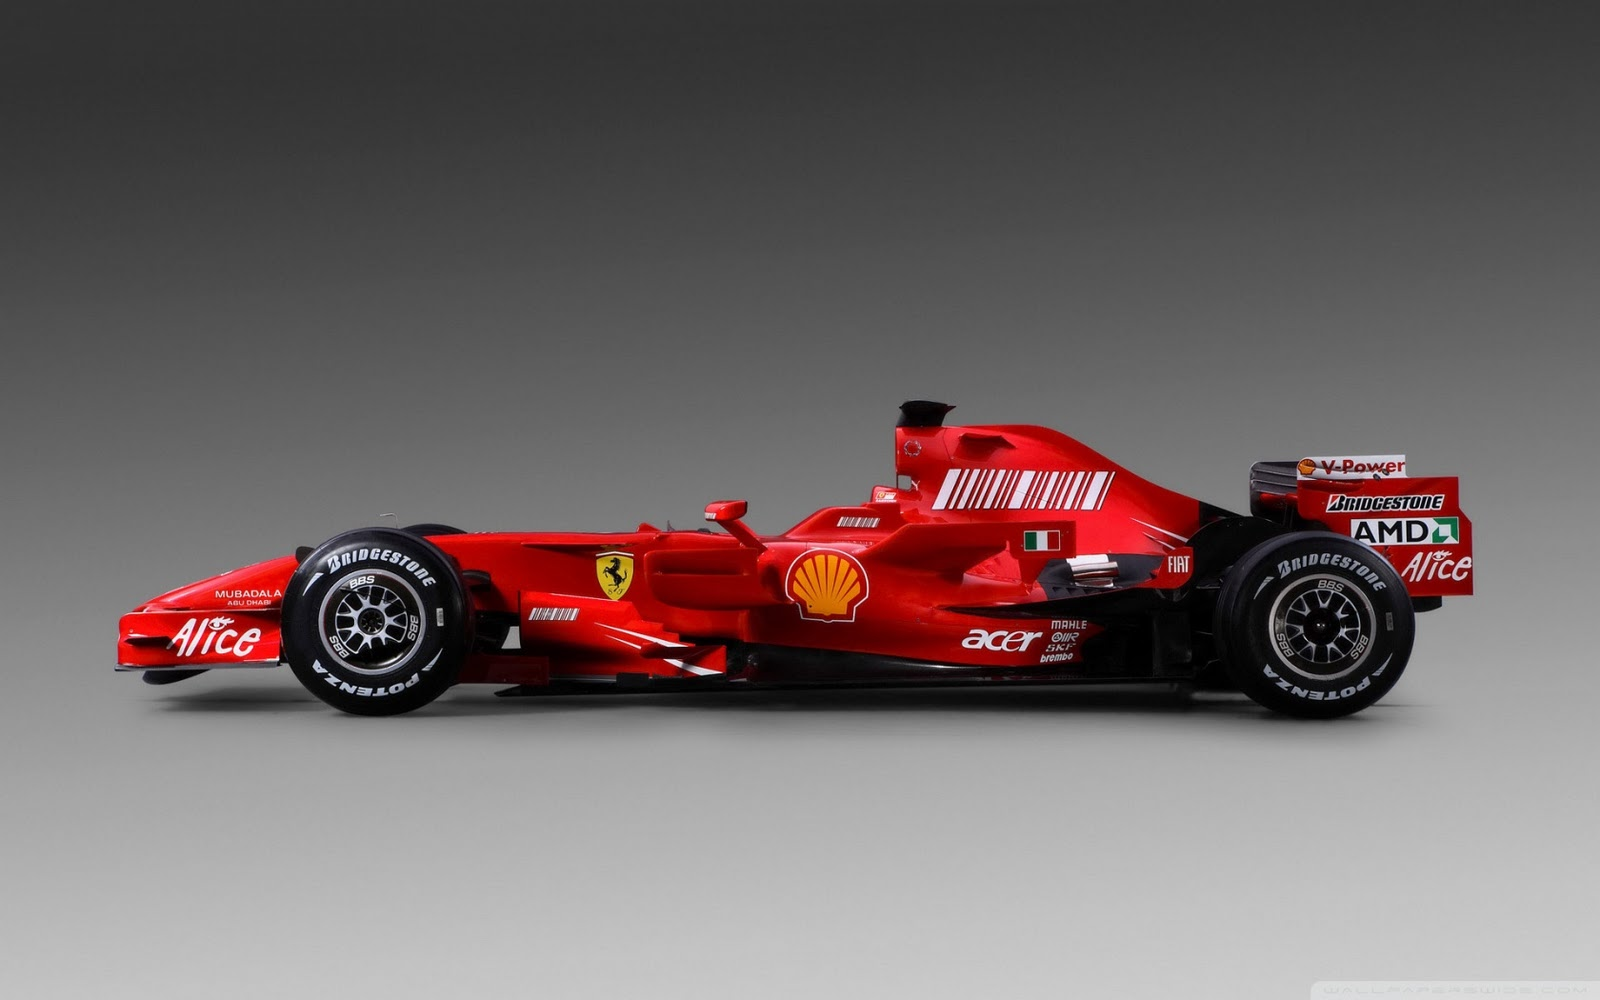 Formule 1 Wallpapers Hd Wallpapers